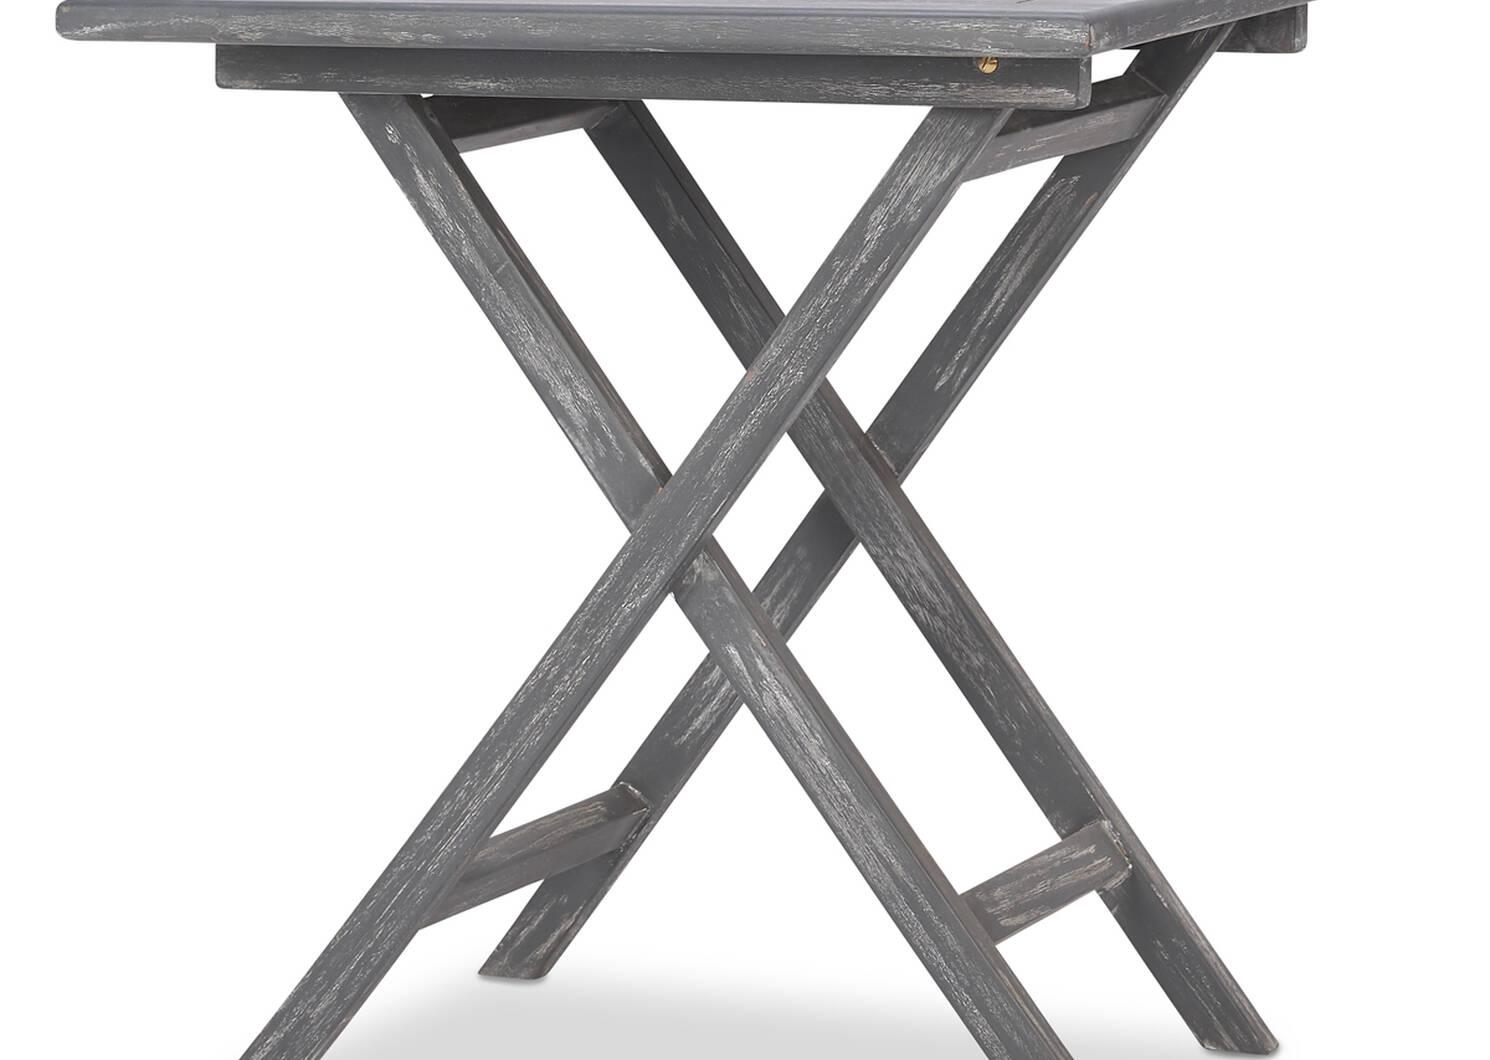 Galiano 3PC Patio Set -Teak Grey